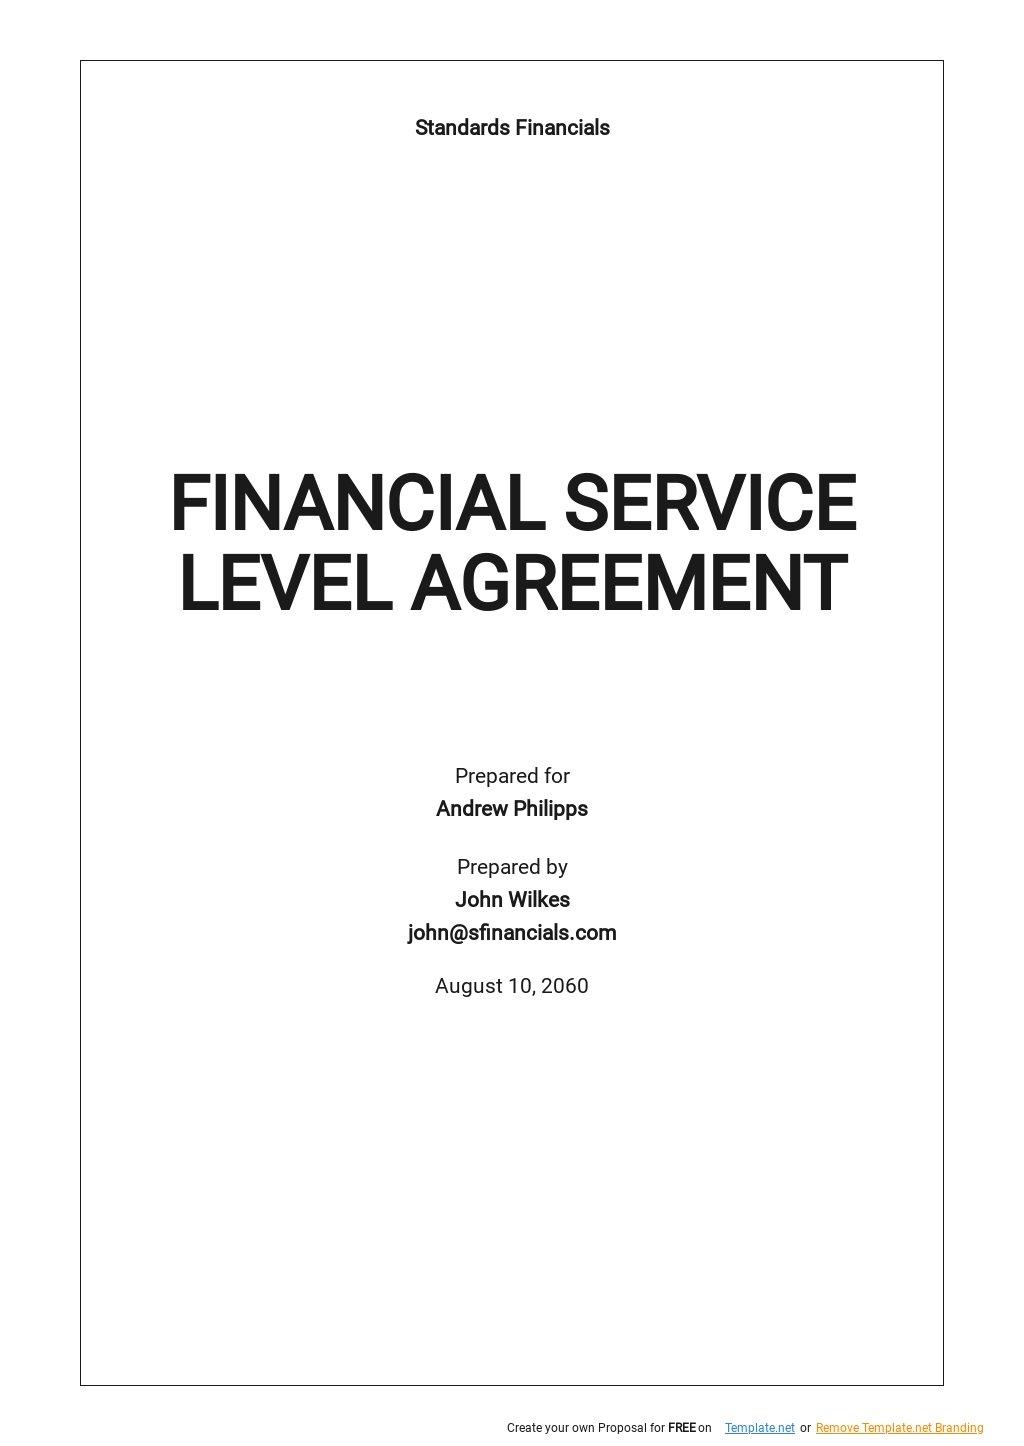 Financial Service Level Agreement Template .jpe